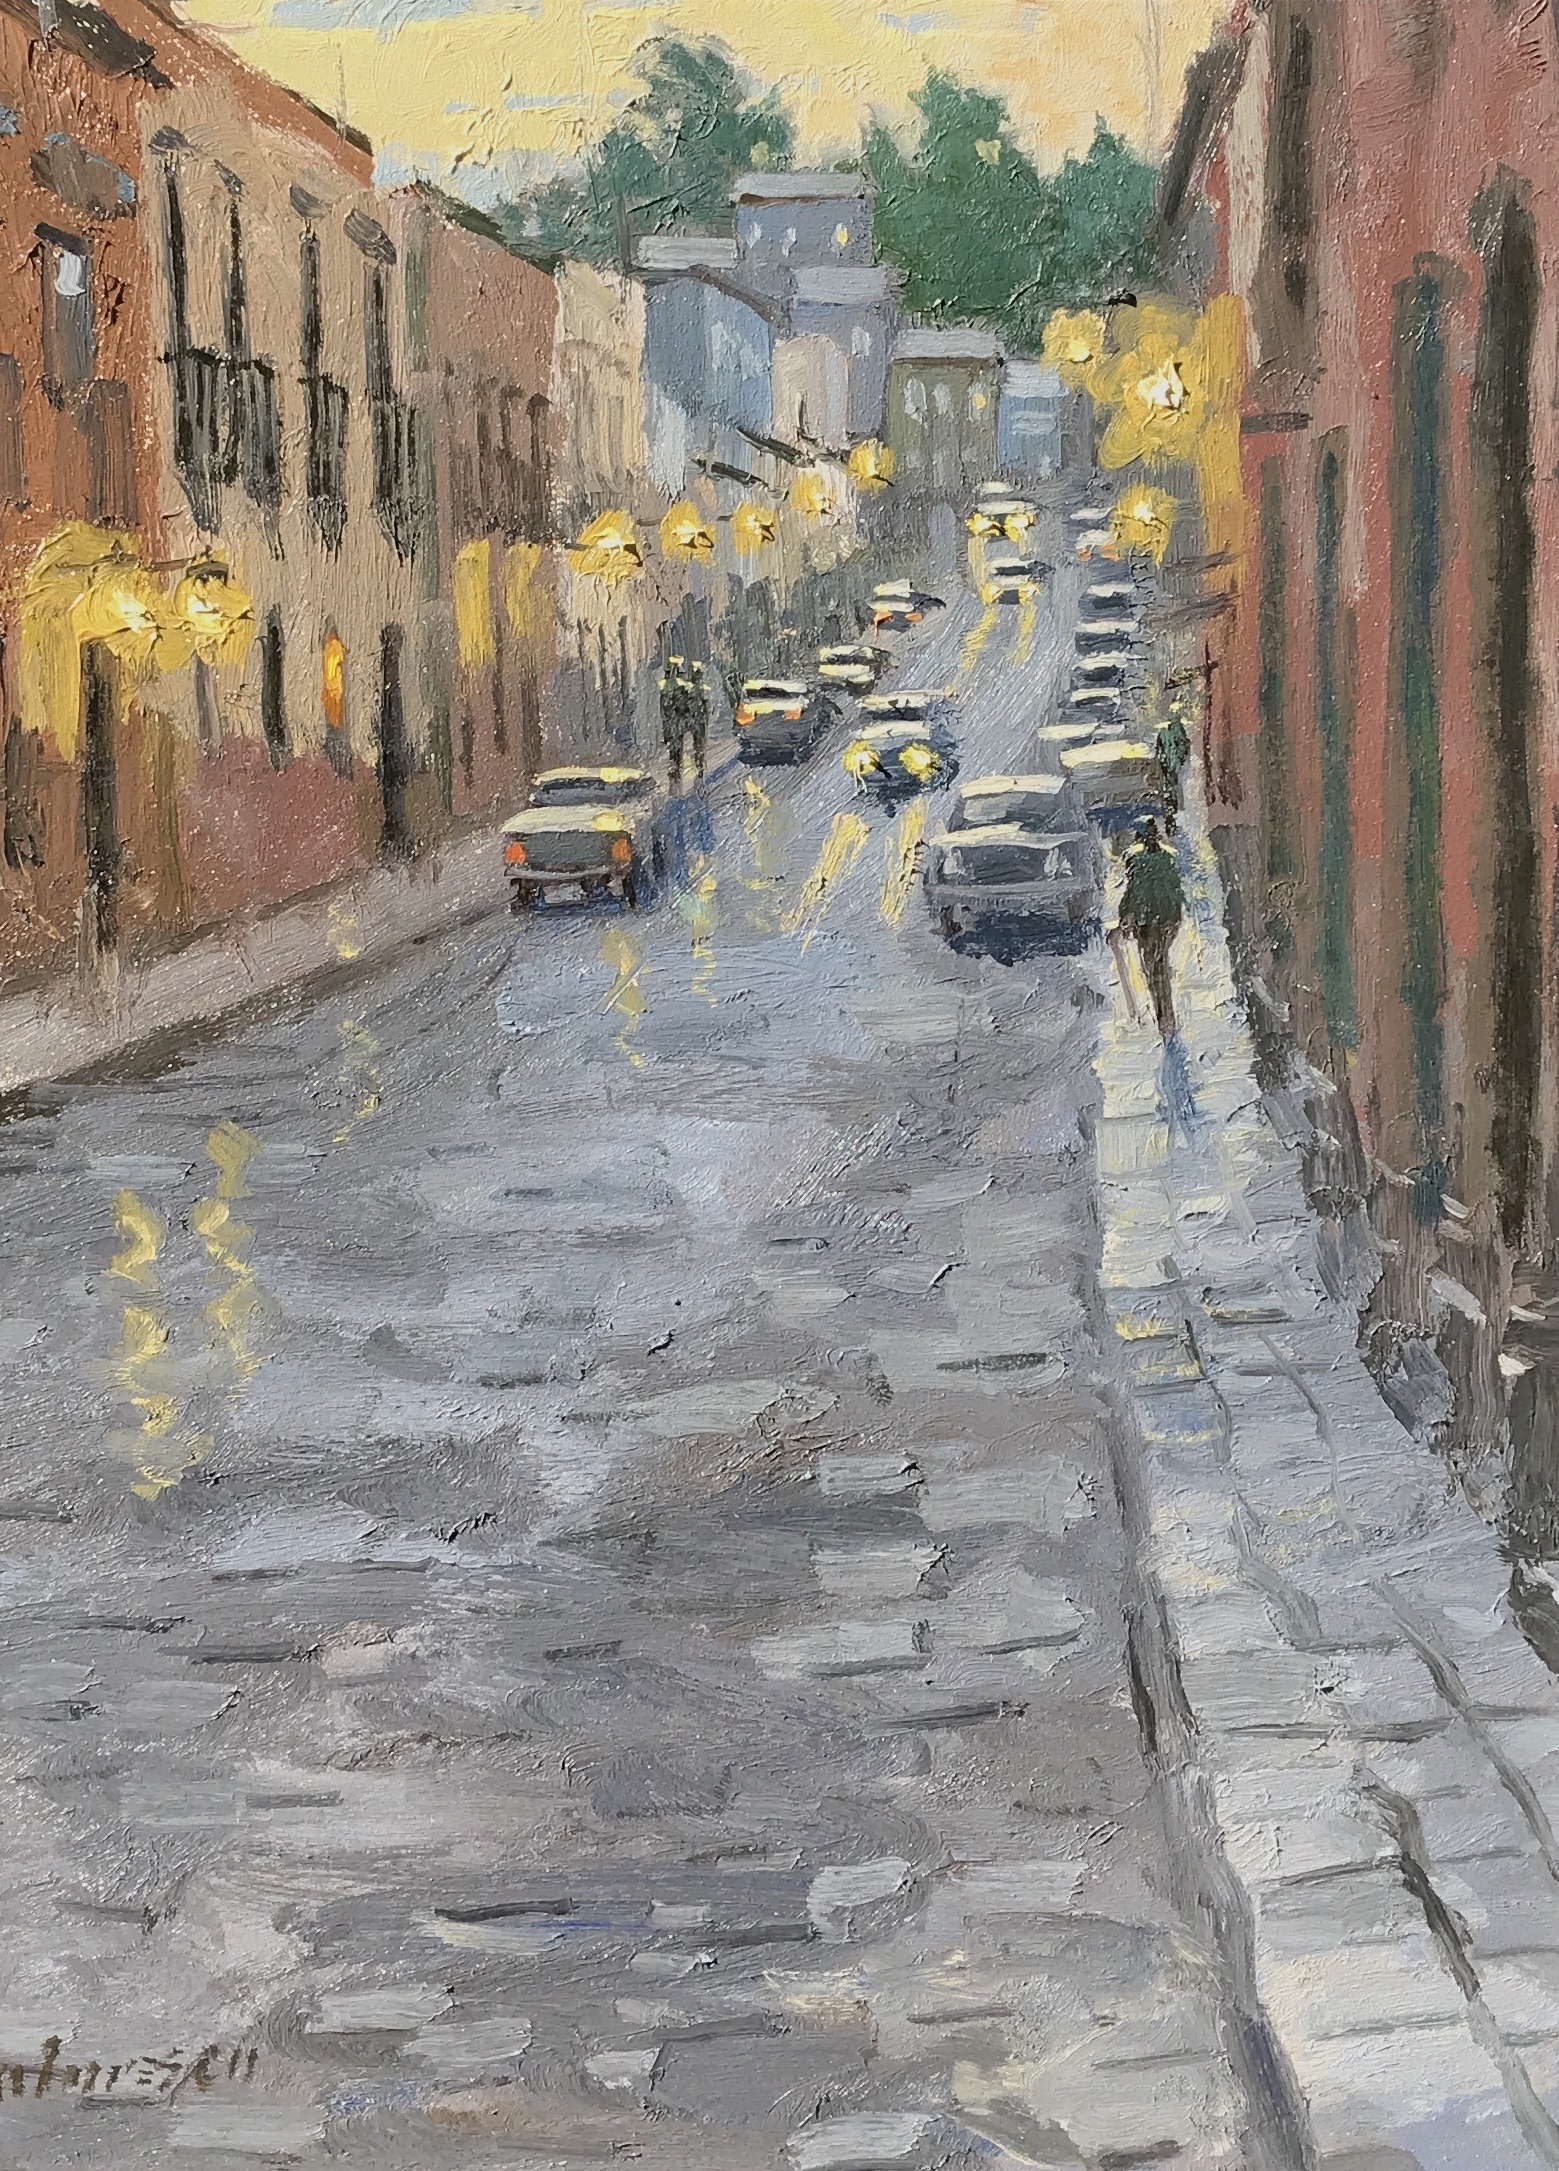 Doloresco-San Miguel-cropped